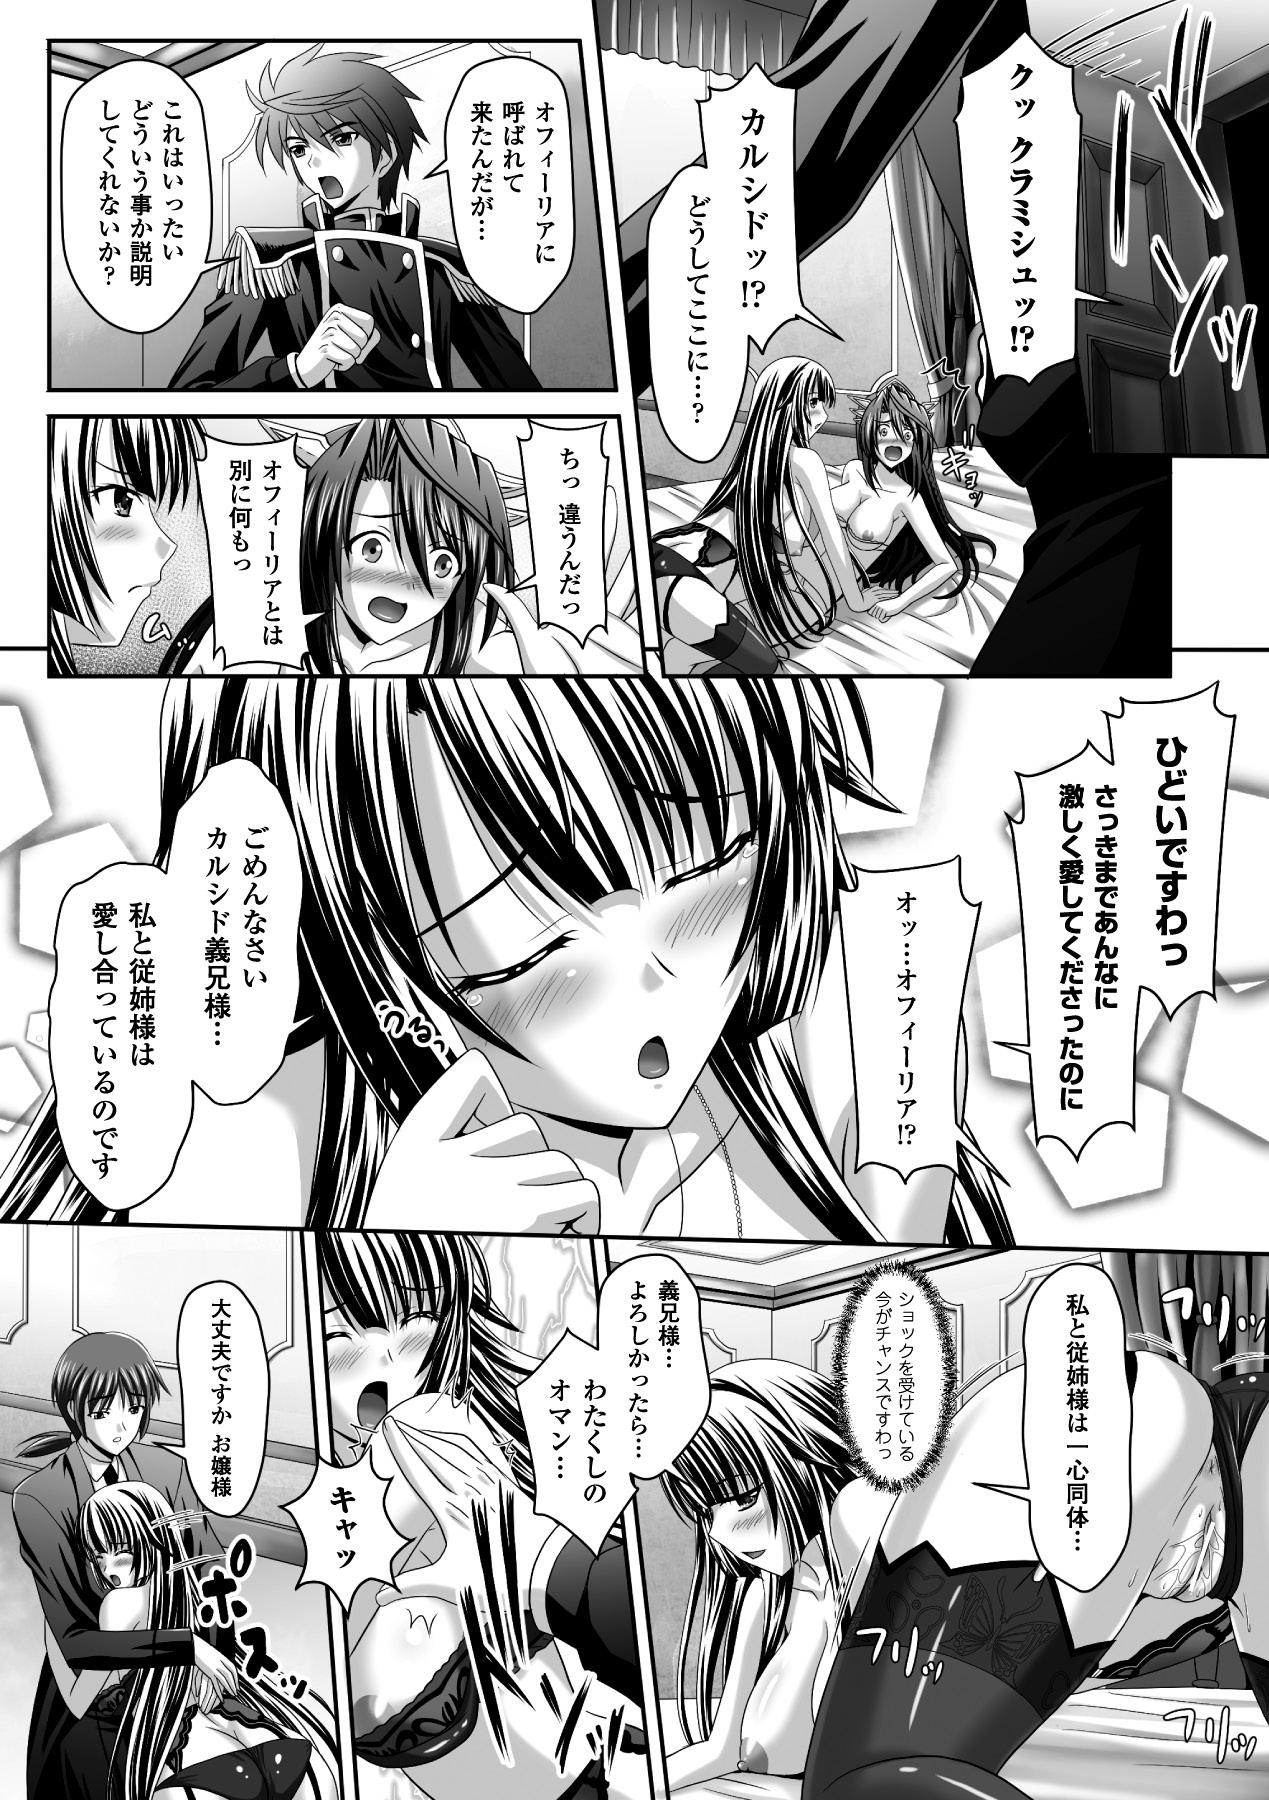 Megami Crisis 10 85